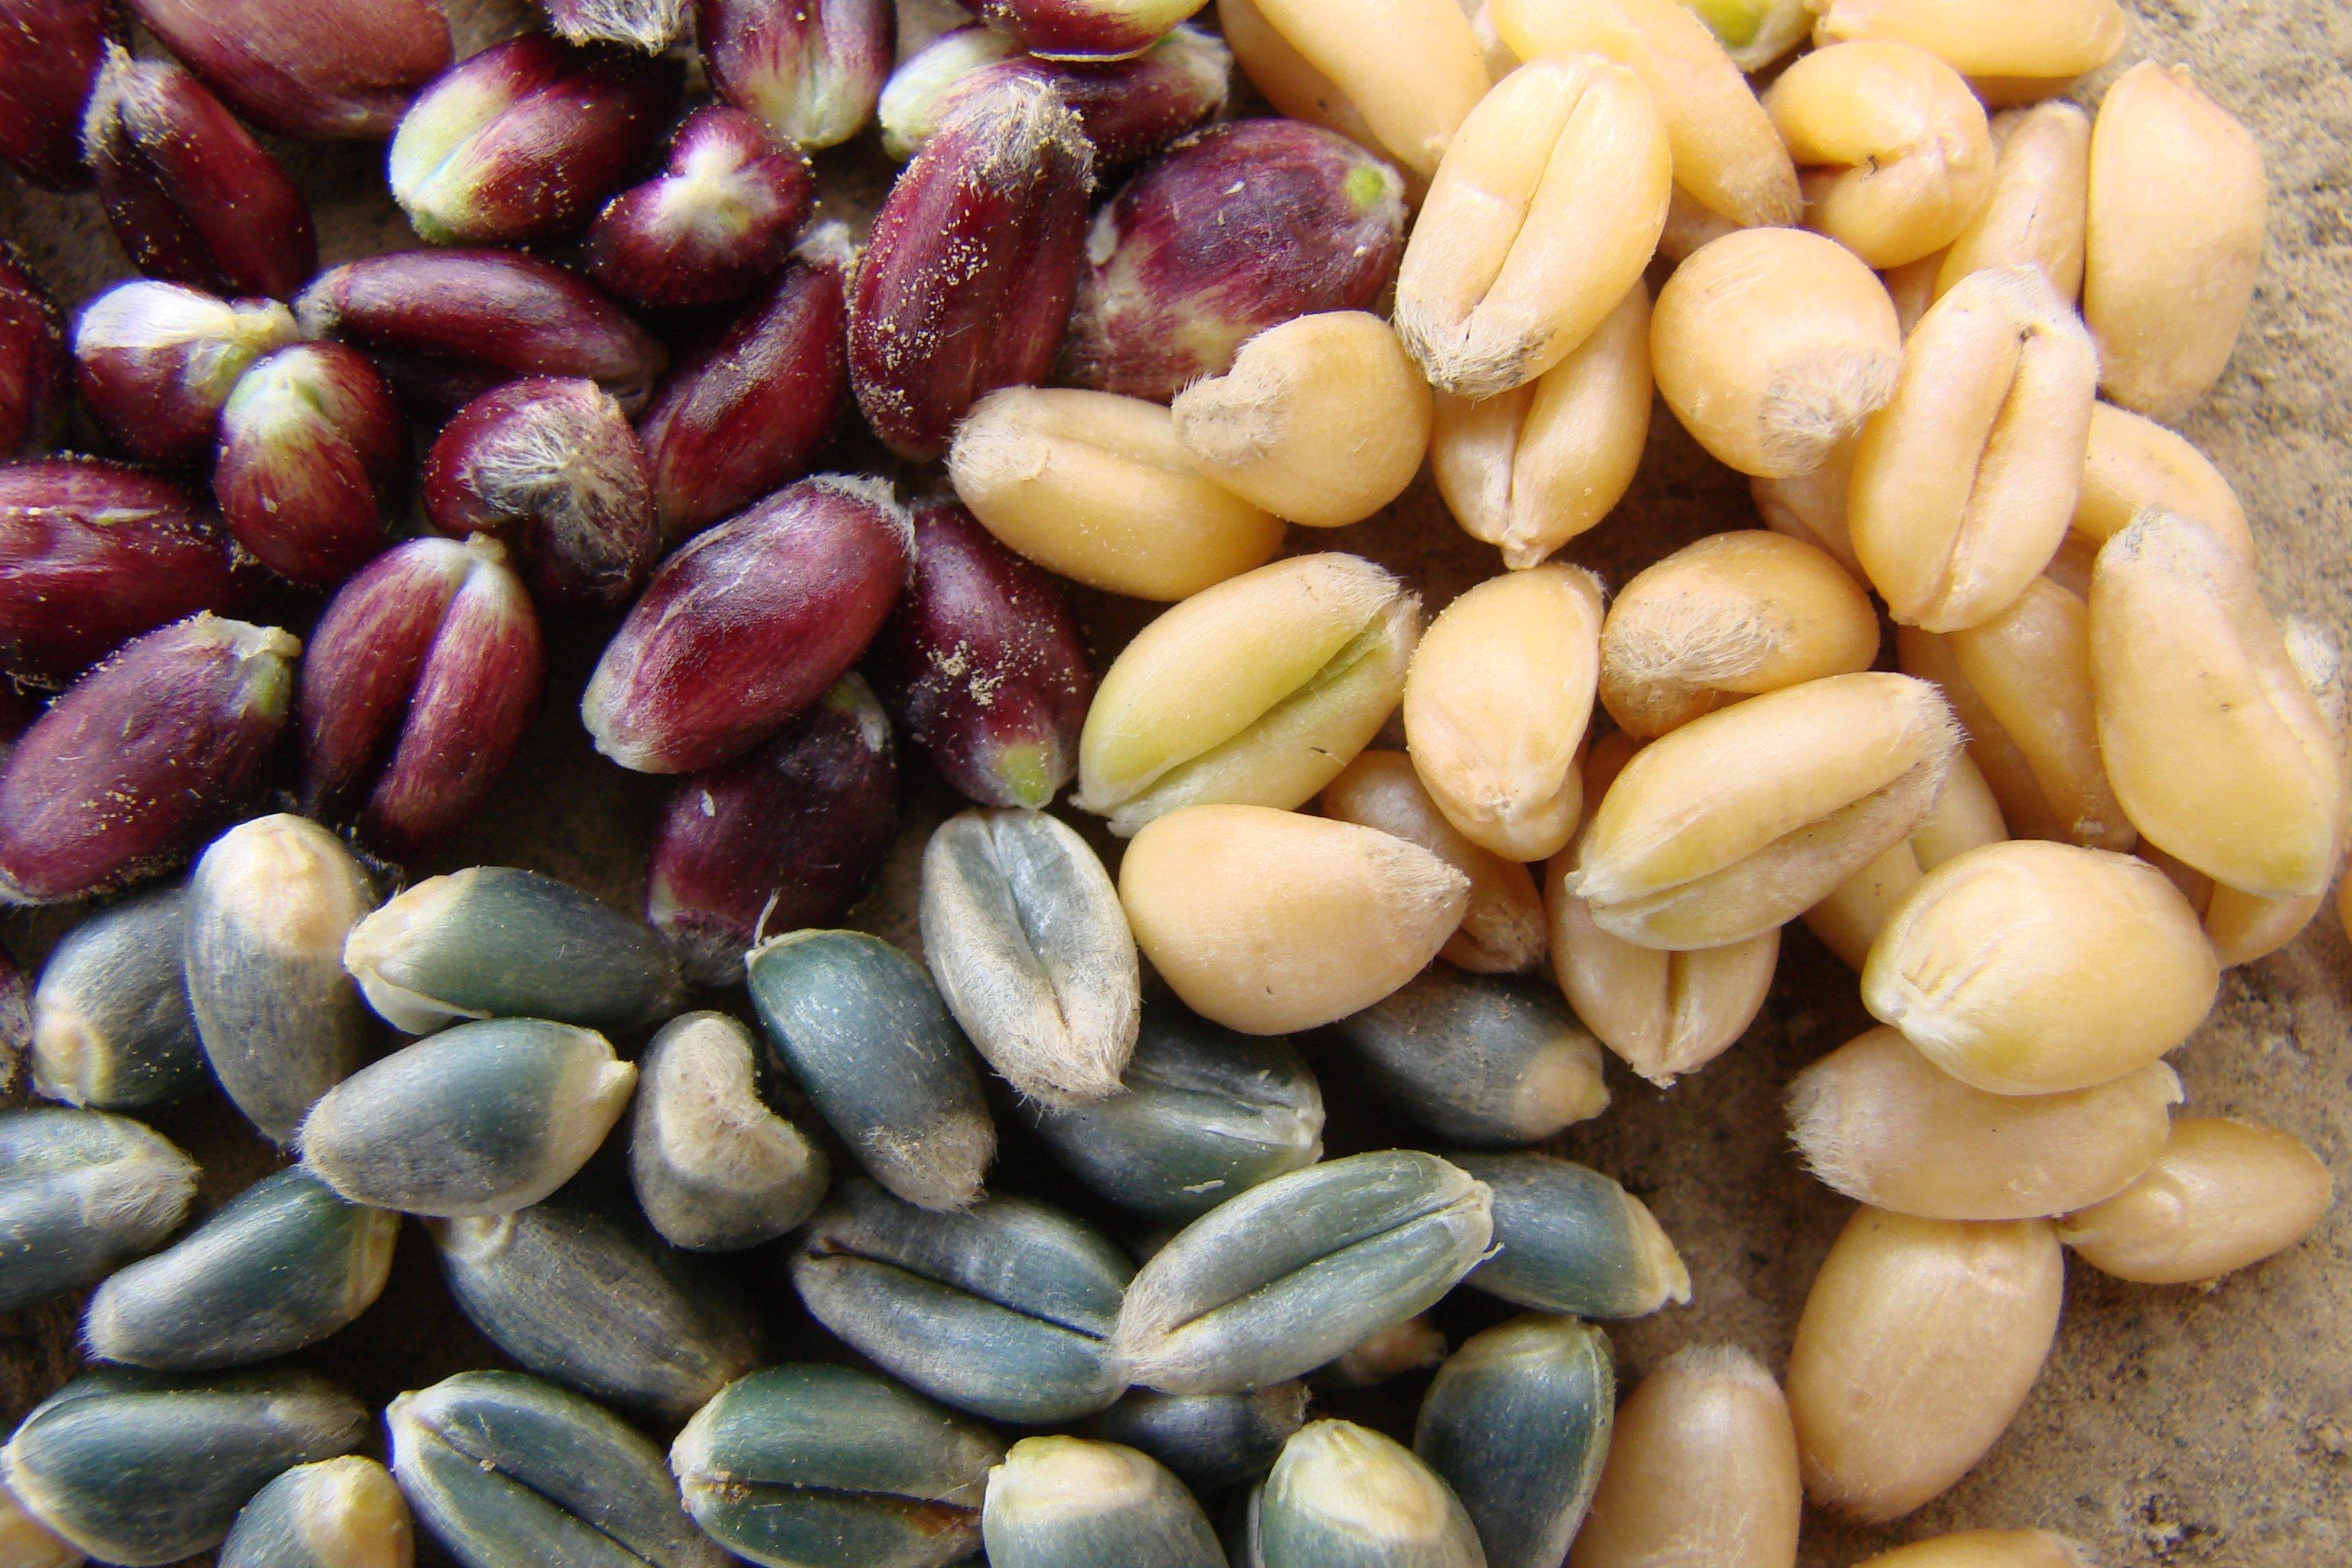 Harvest of winter wheat